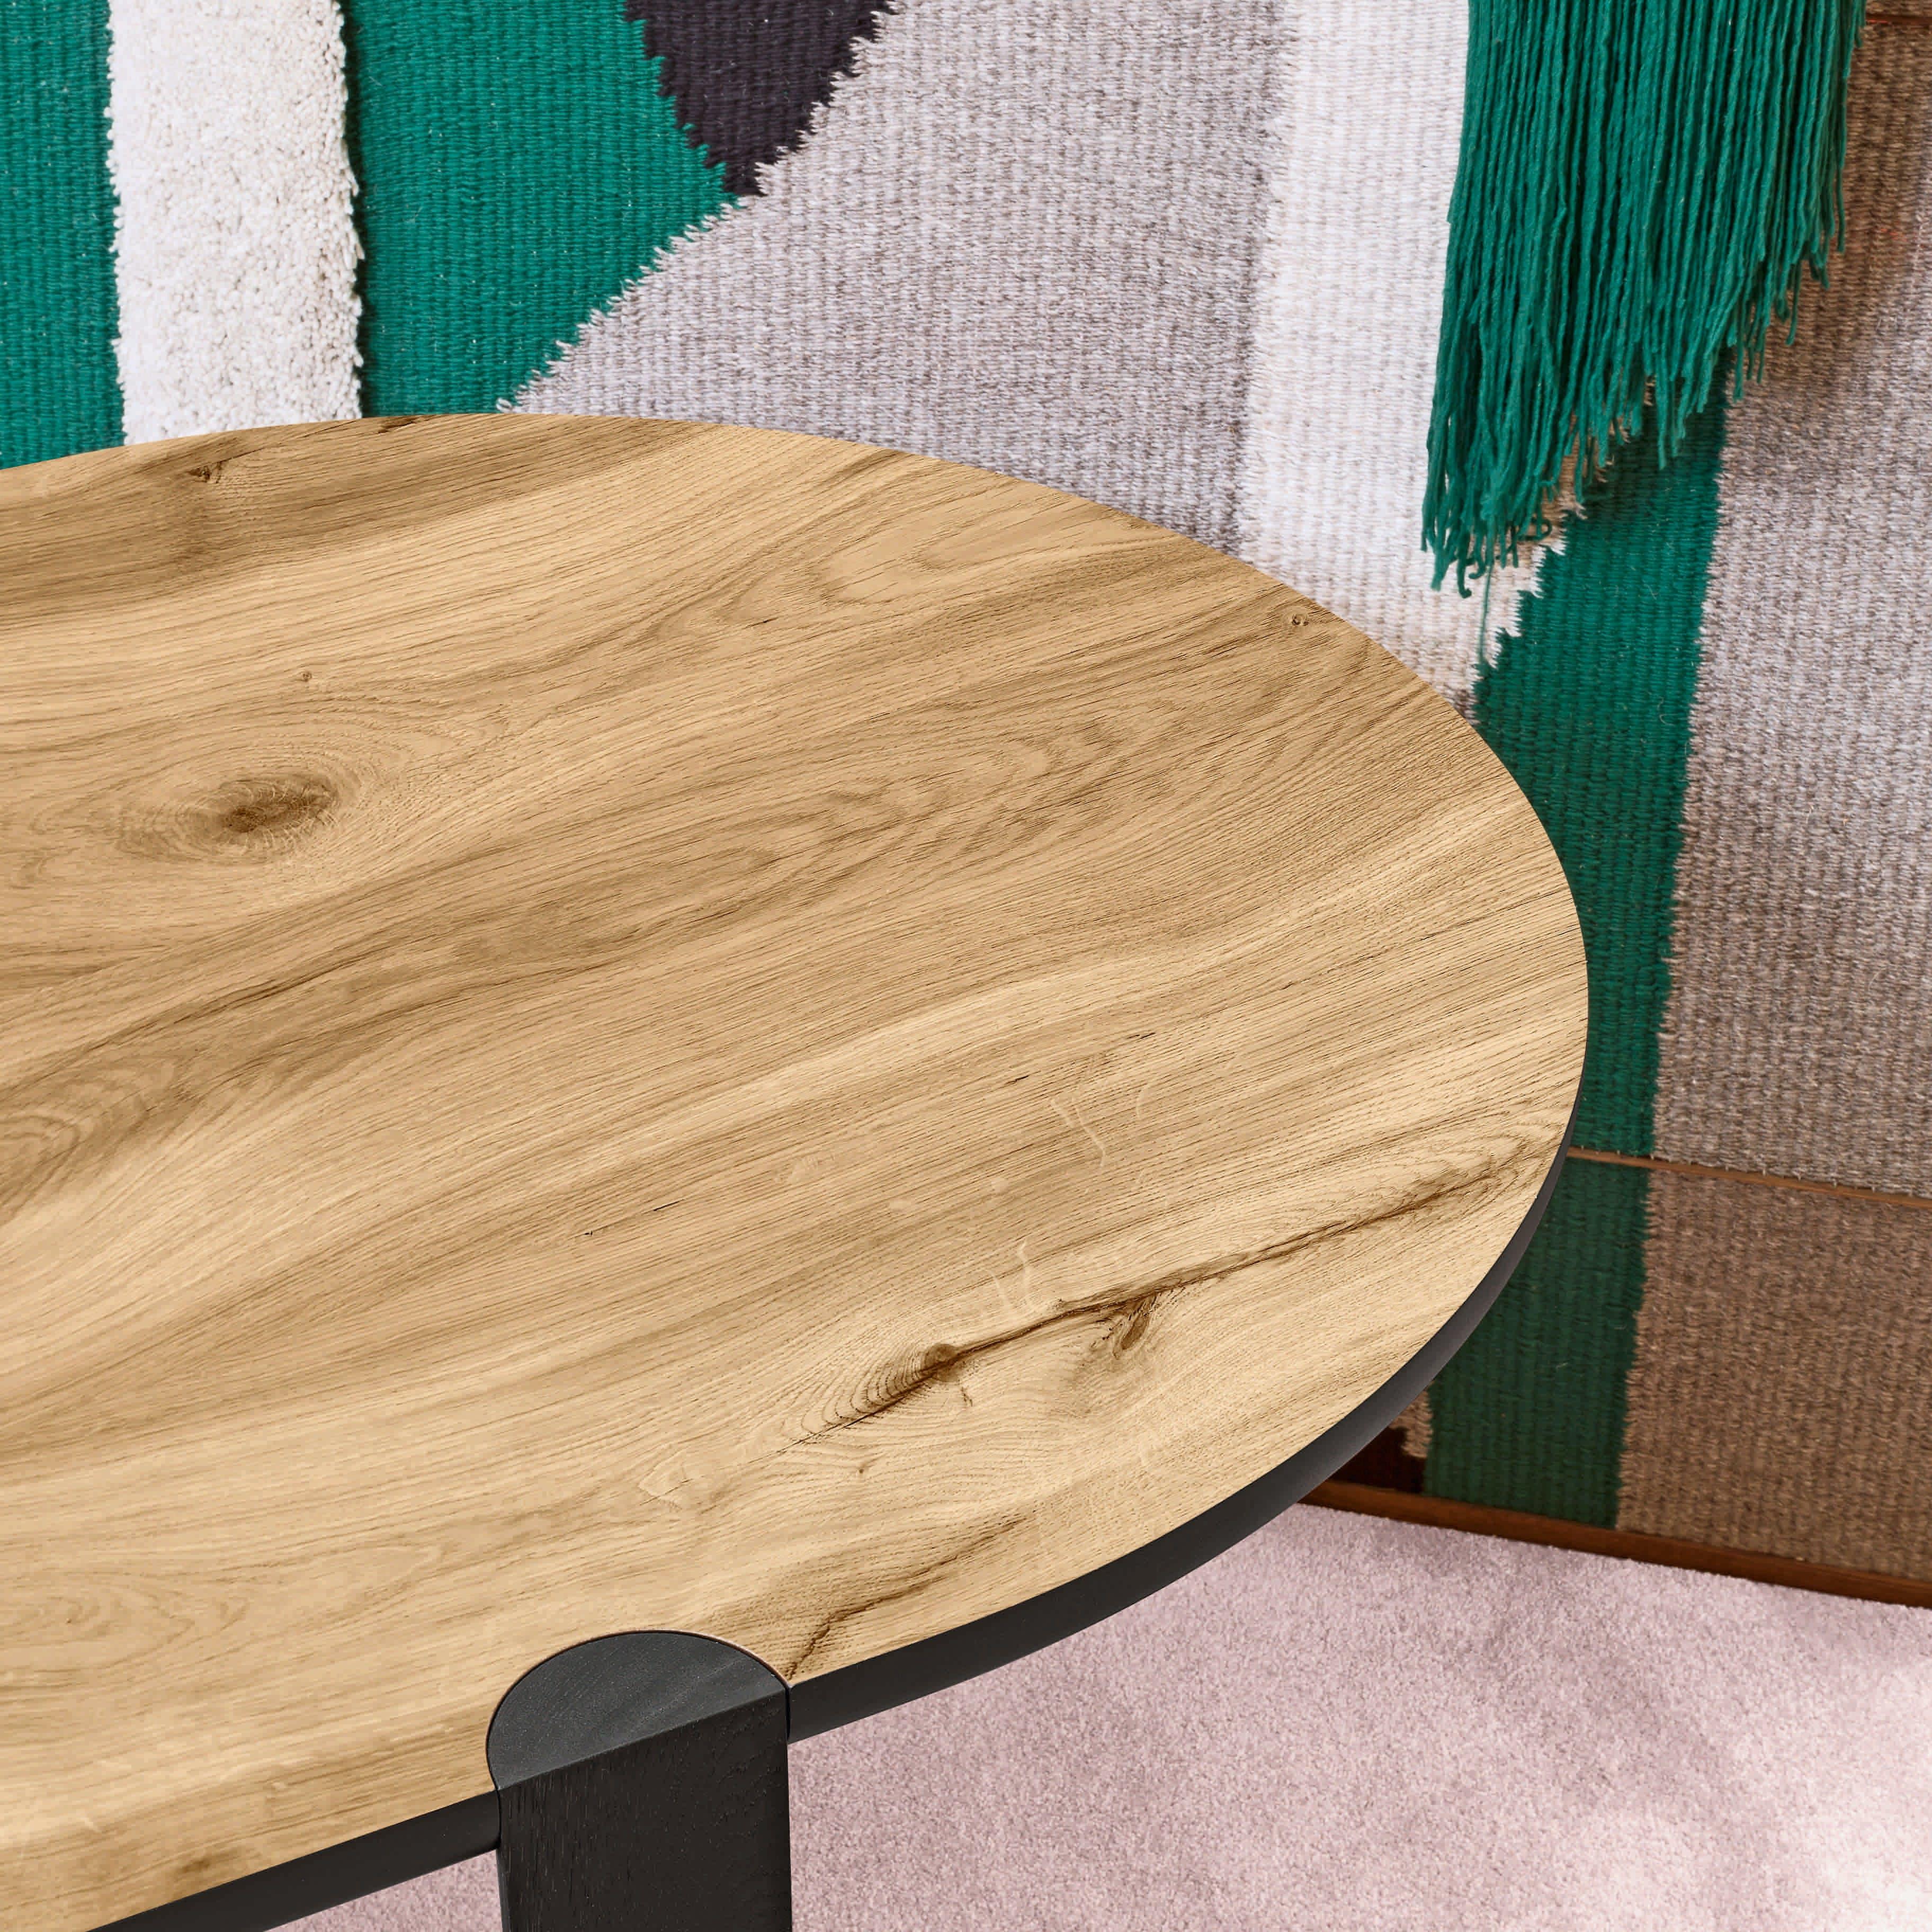 Miniforms Ovo Table Table Detail Haute Living